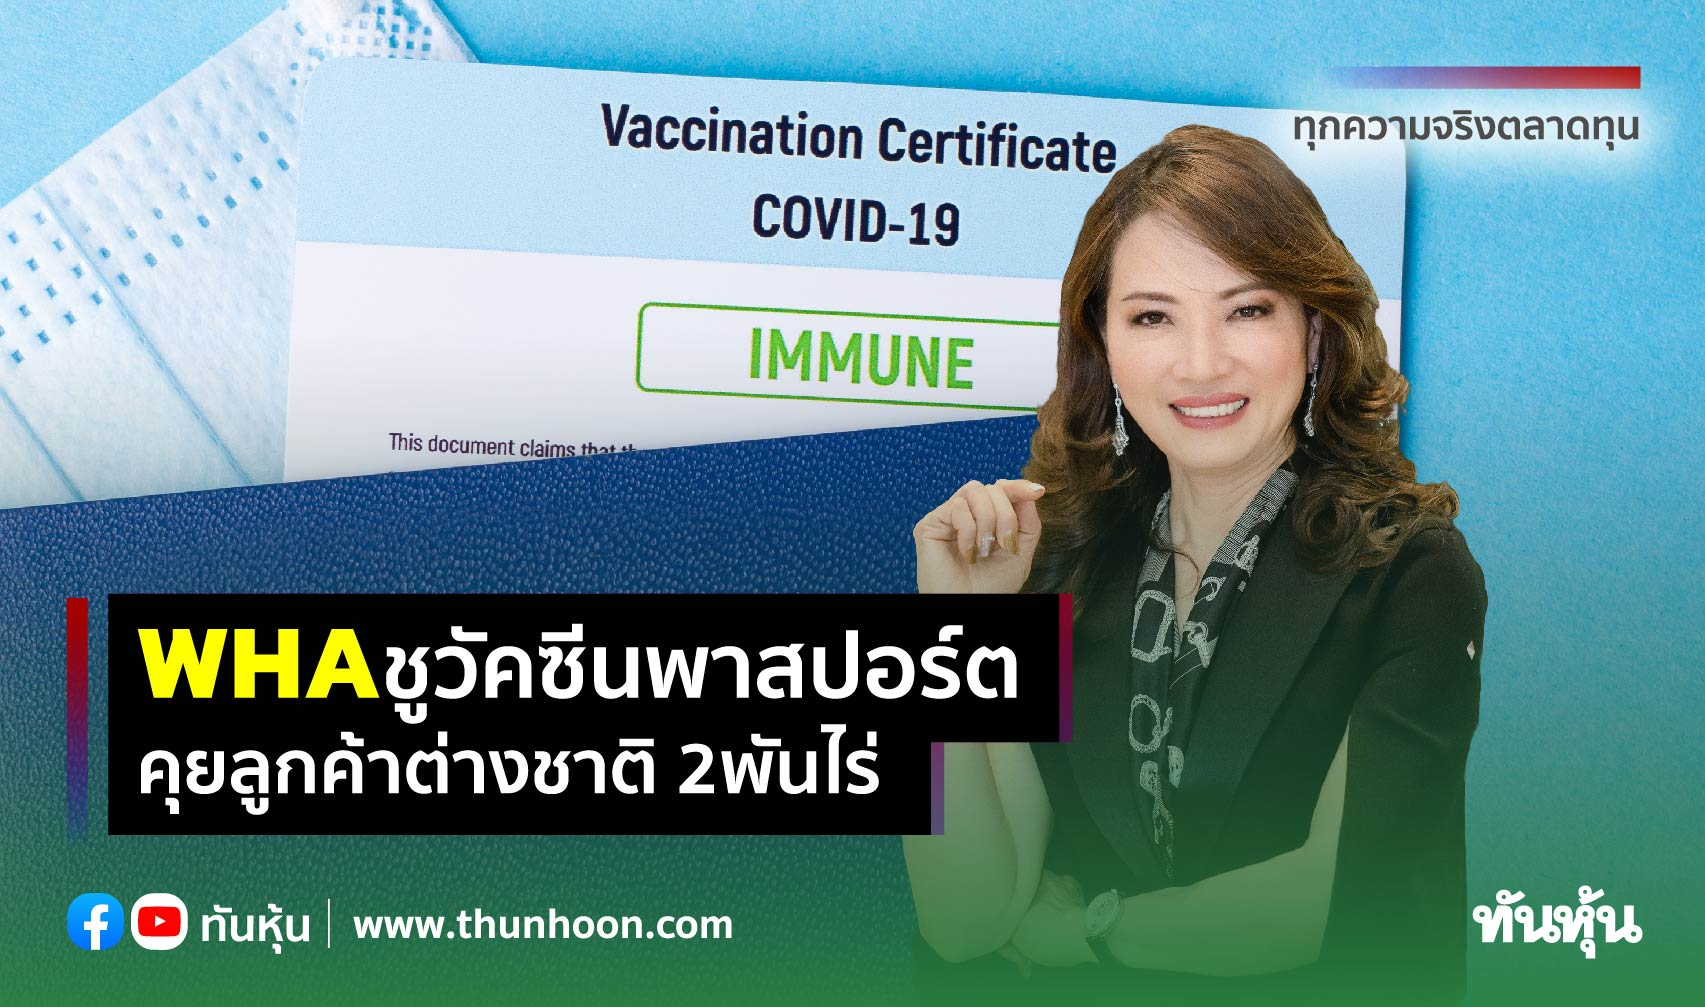 WHAชูวัคซีนพาสปอร์ต คุยลูกค้าต่างชาติ2พันไร่